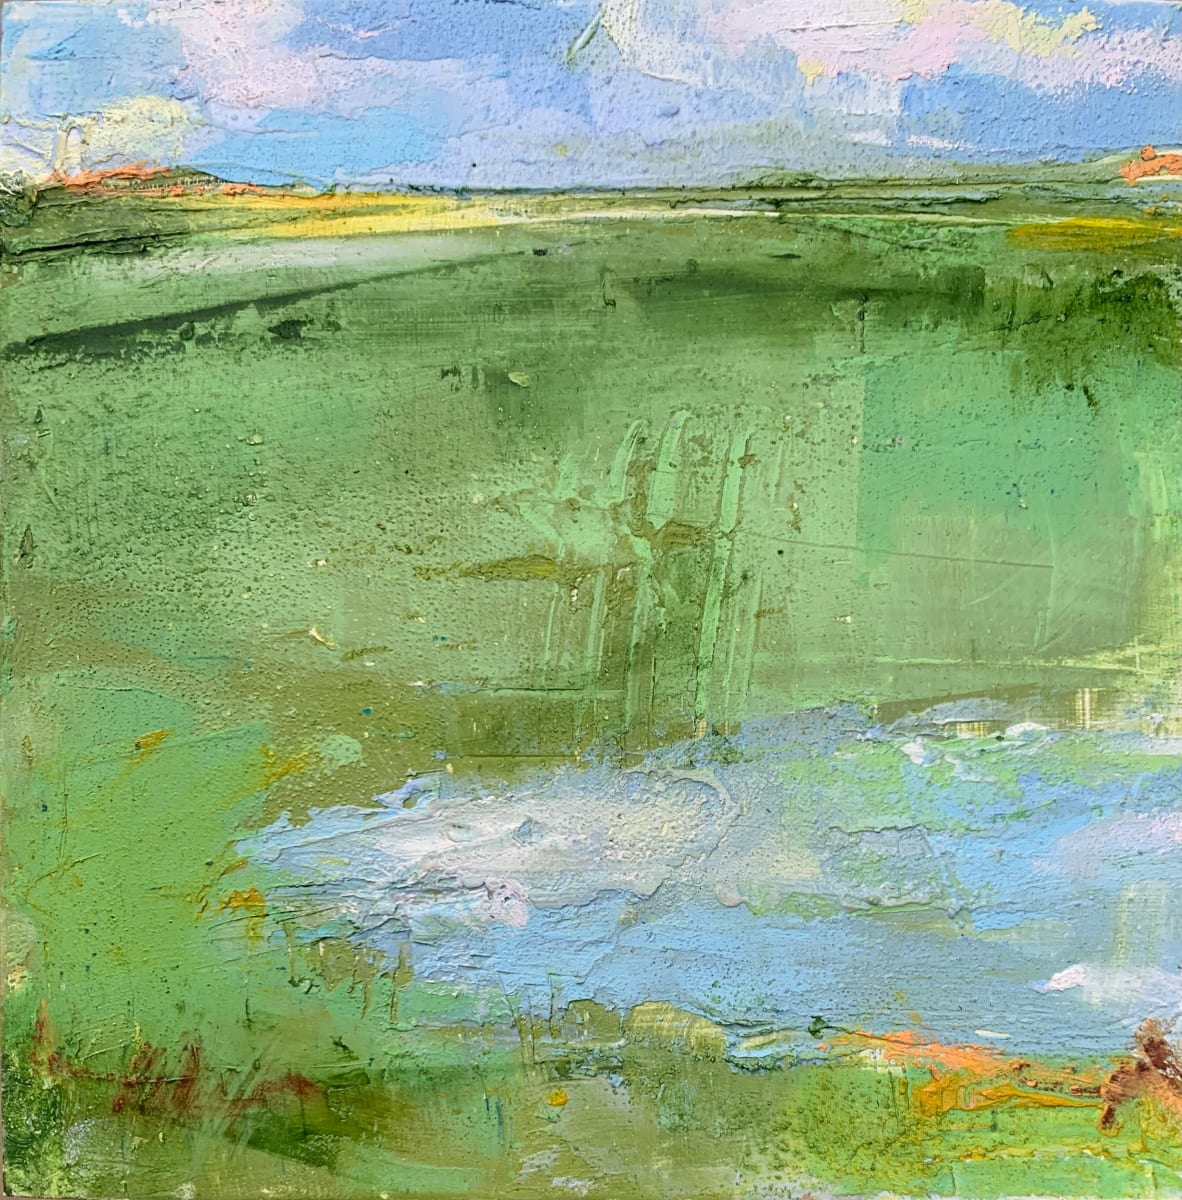 Little Landscape #2 by Sally Hootnick